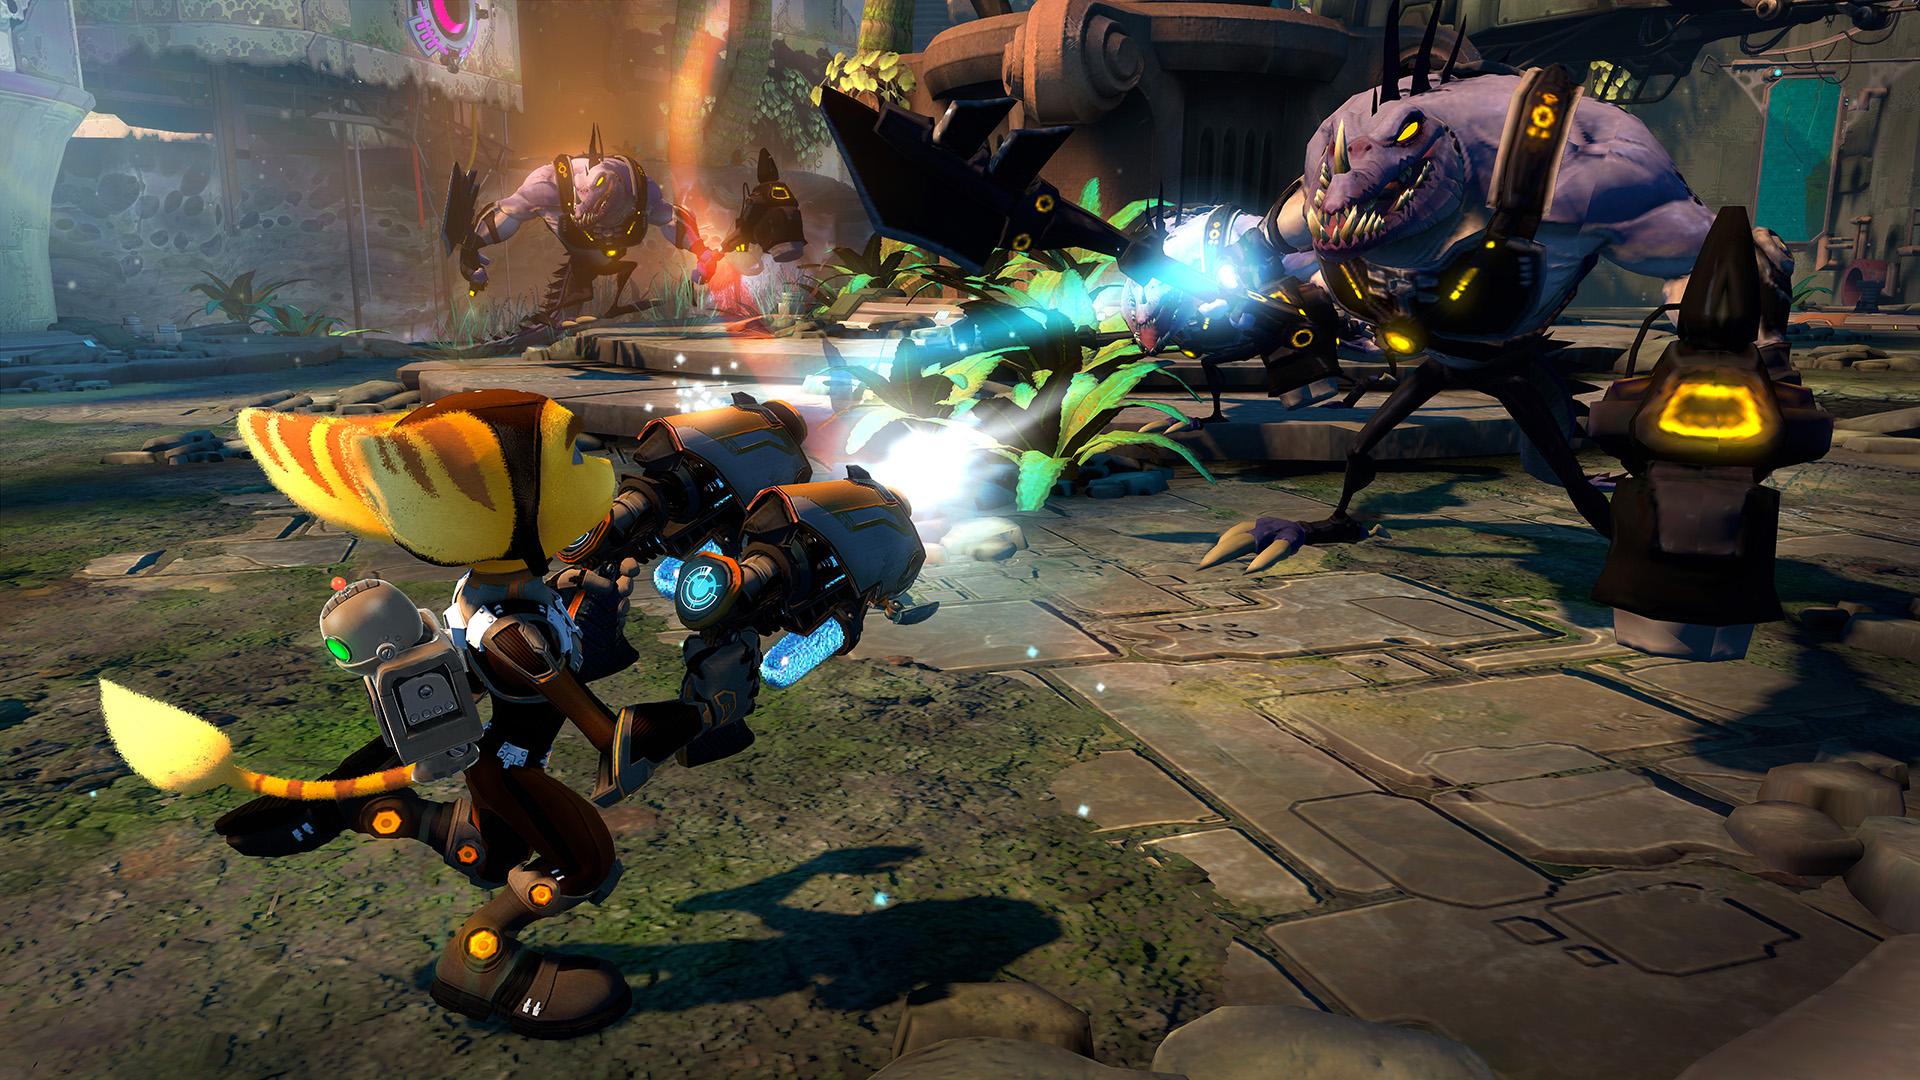 Ratchet & Clank PS3 omniblast